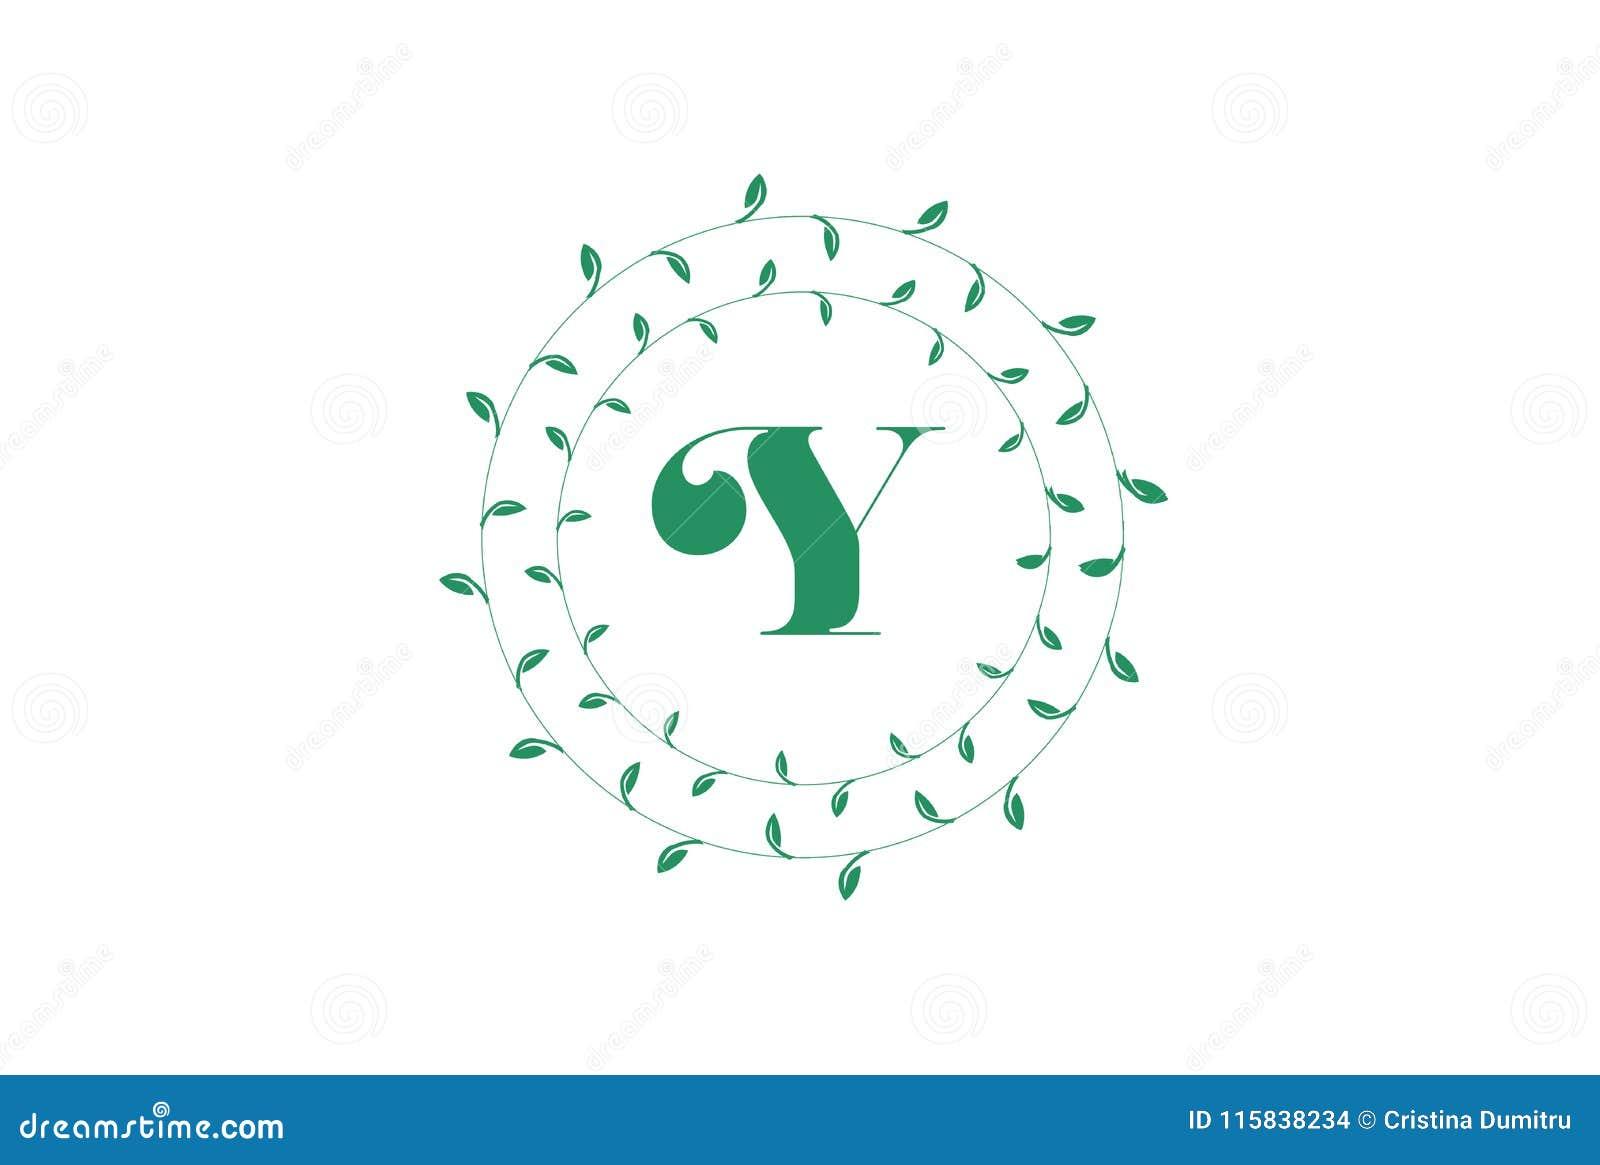 letter y logo with round green leaves elegant floral monogram template design